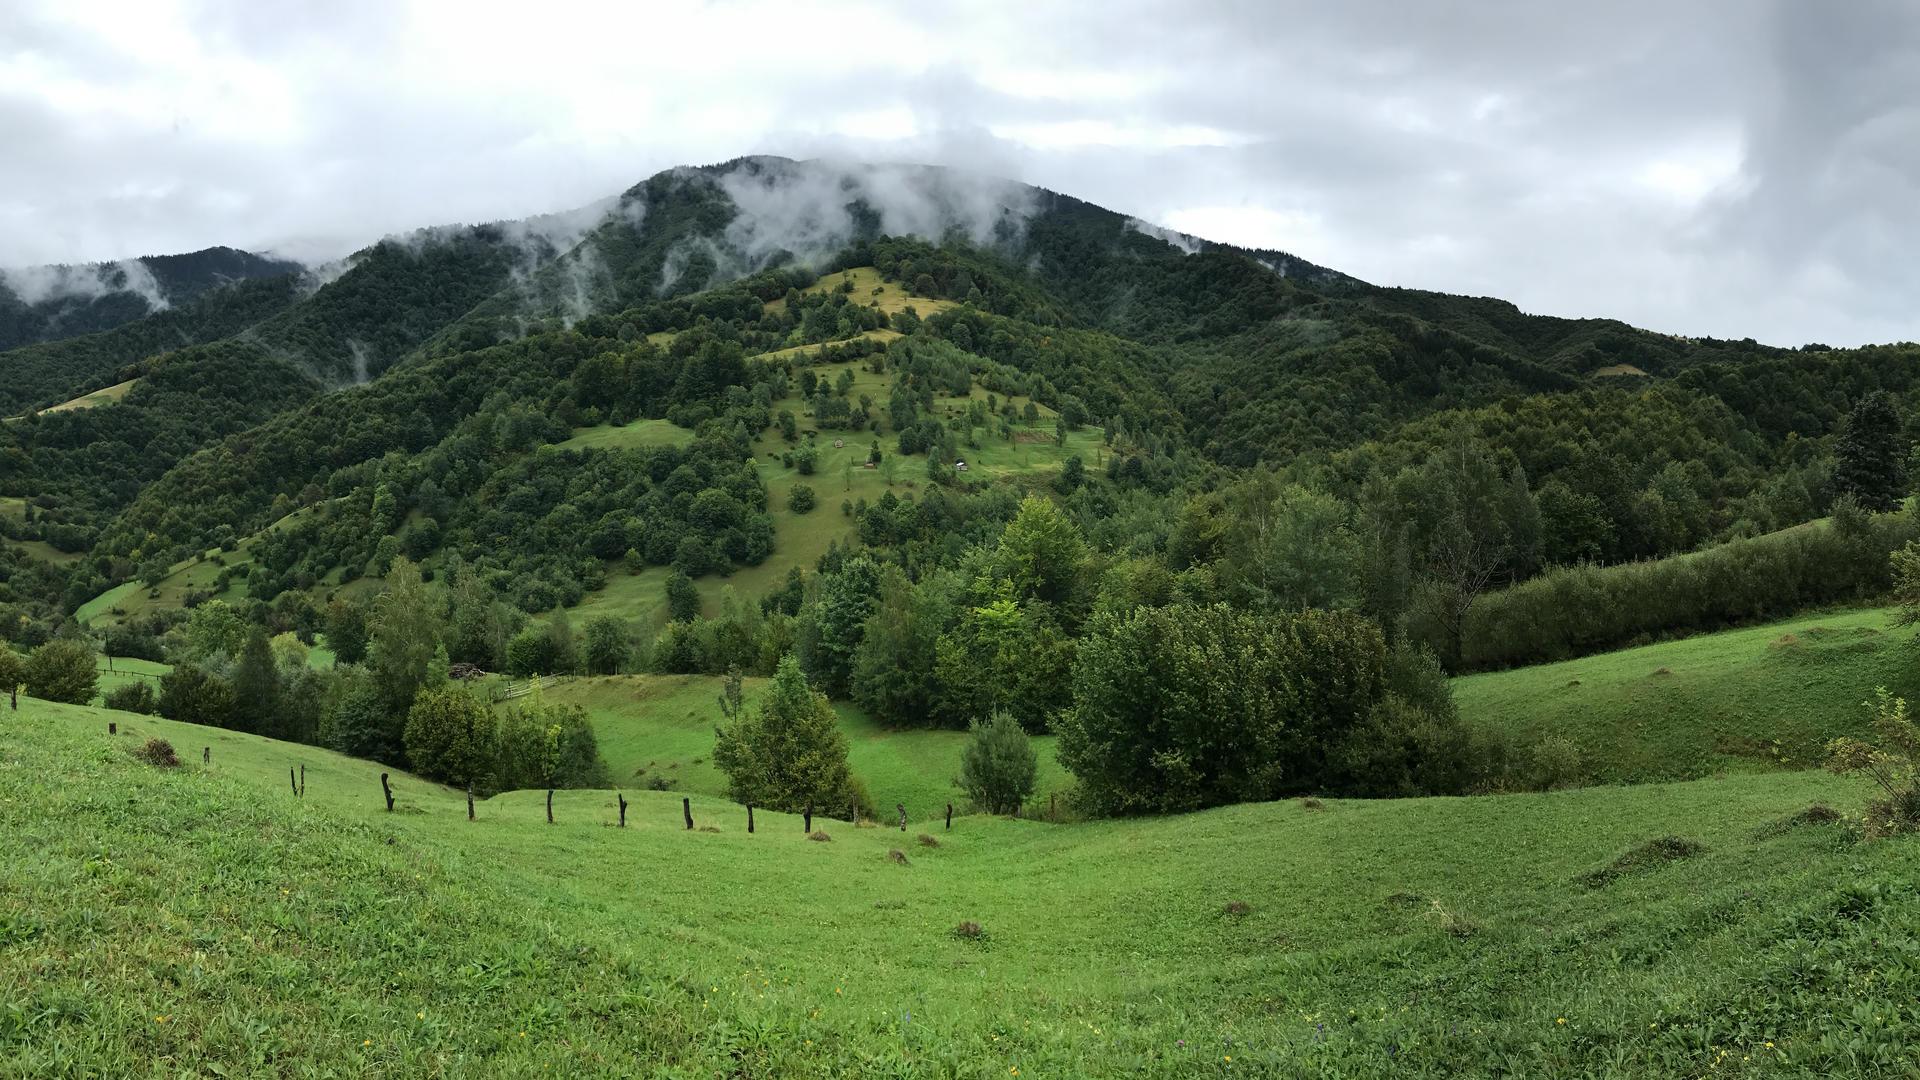 green lushes, clouds kolochava, clouds svidovec, carpathians clouds, after rain svidovec